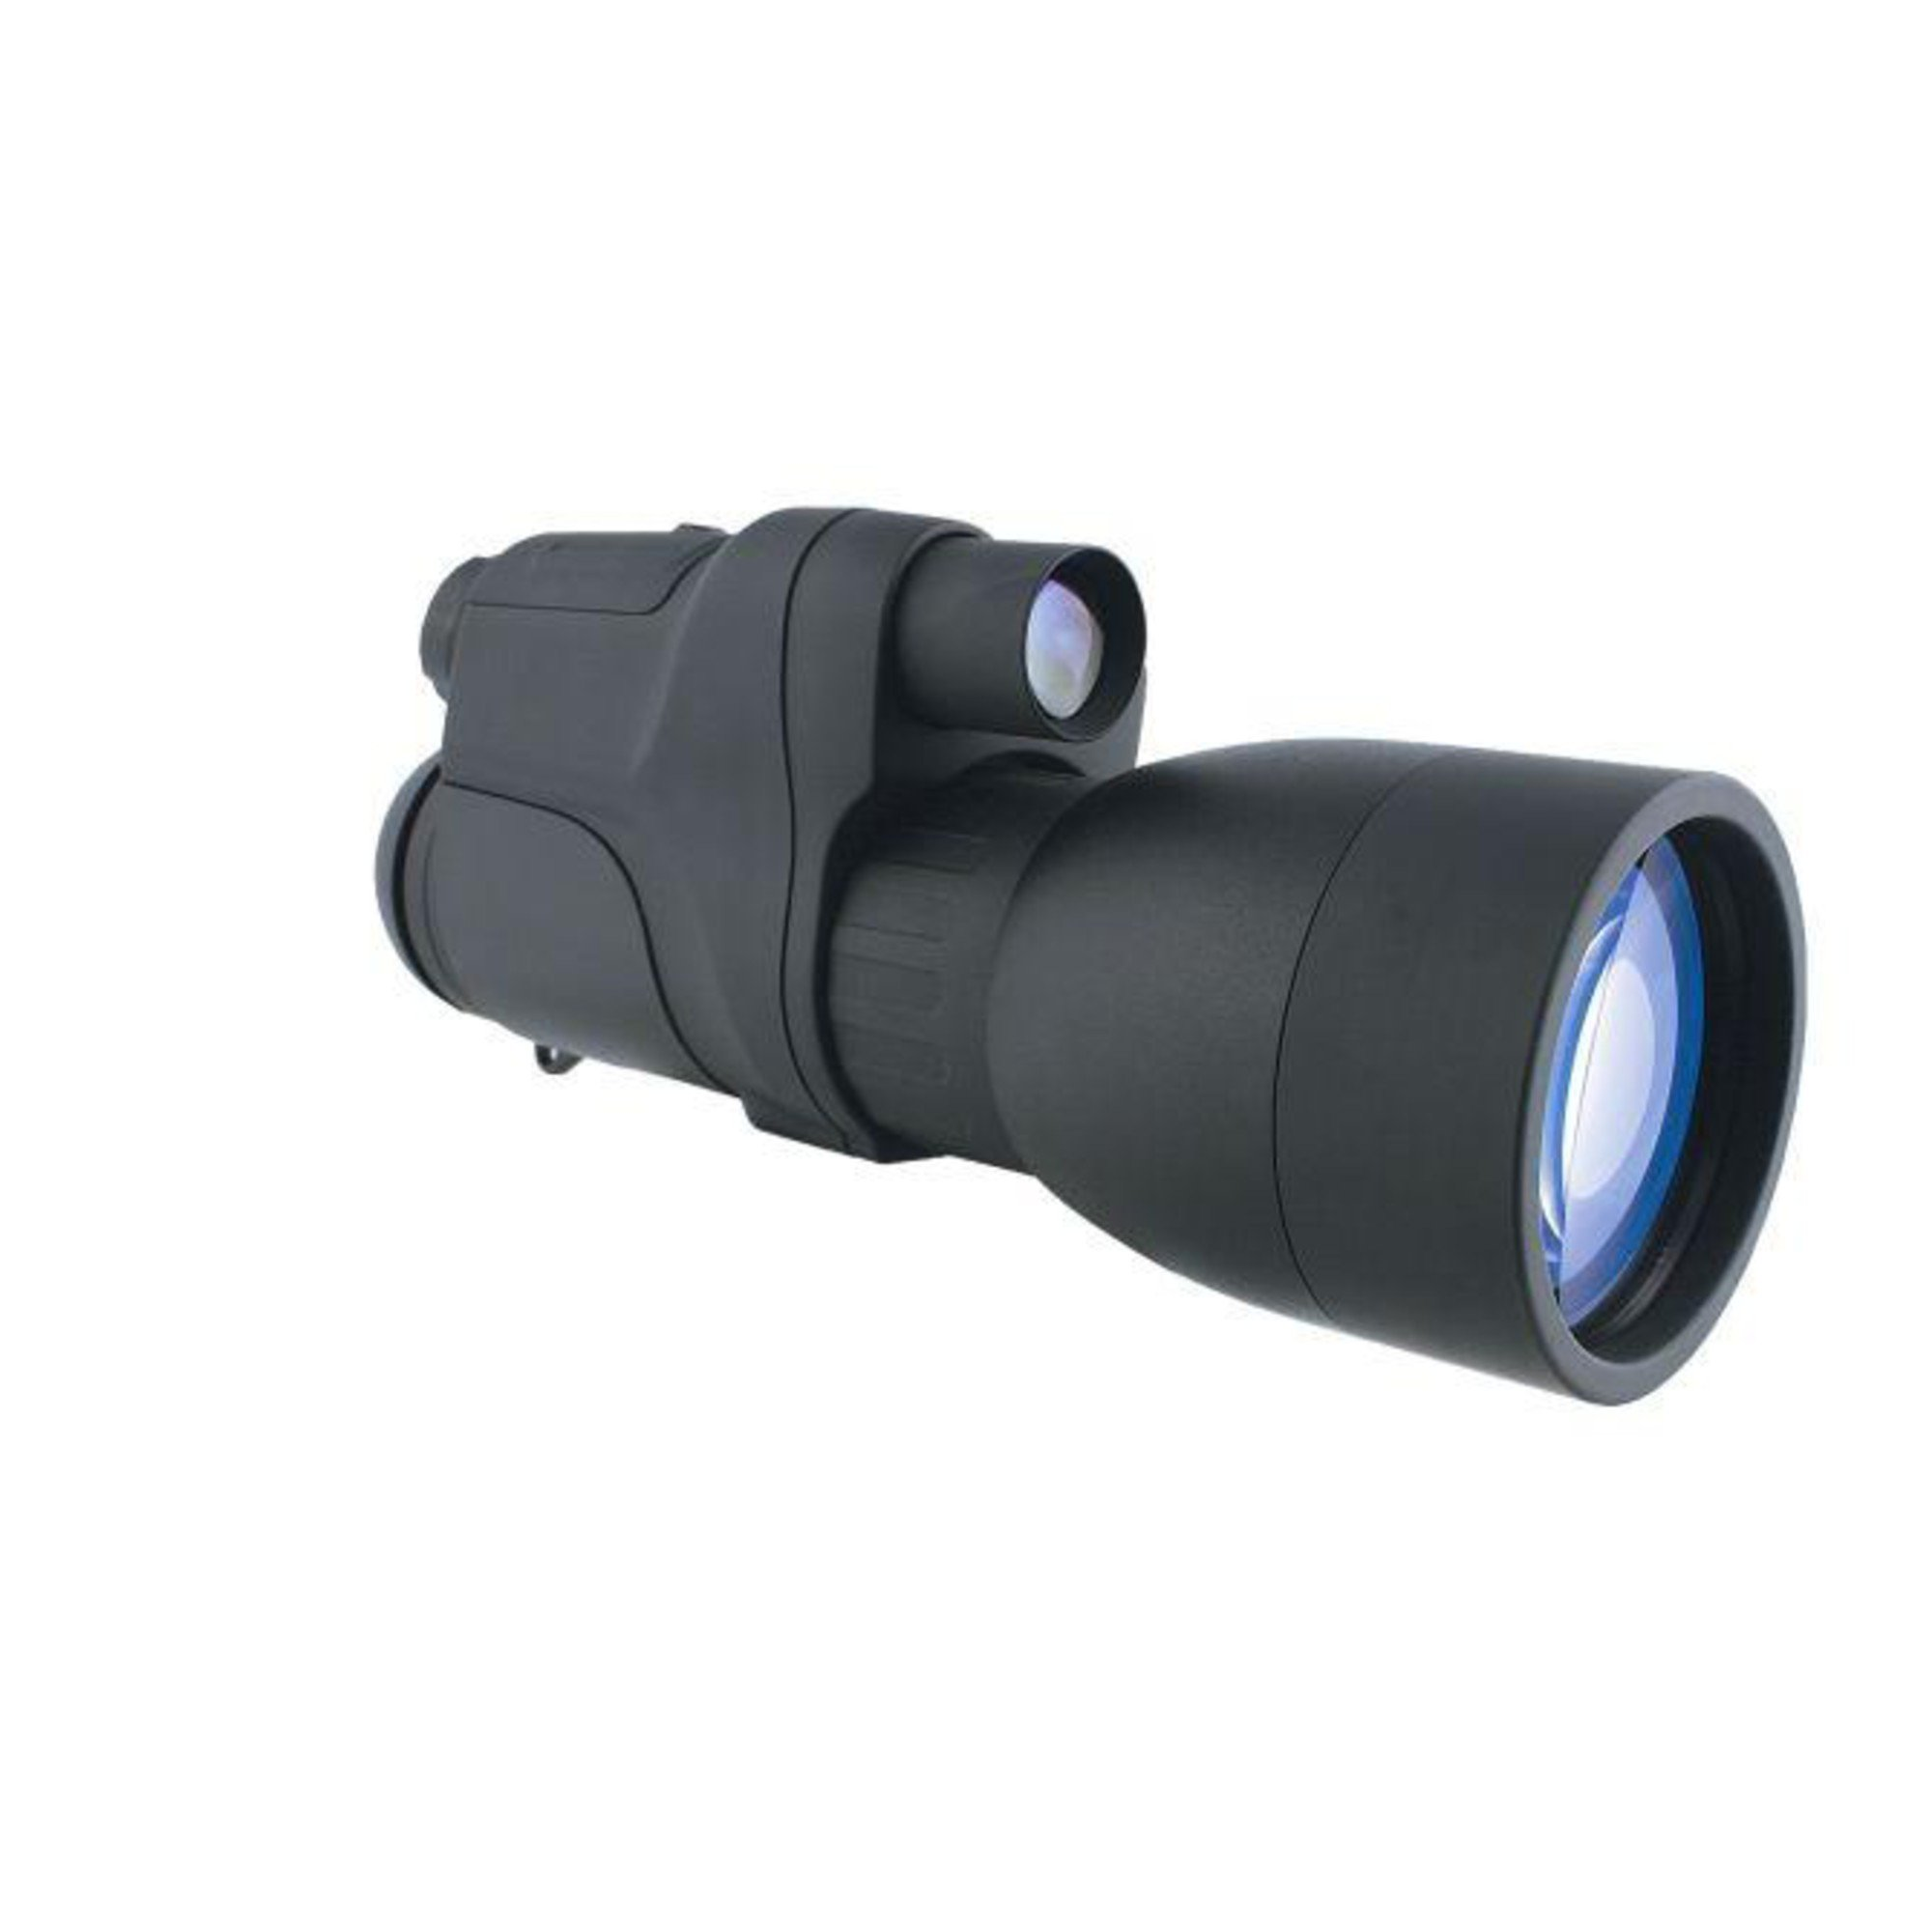 Yukon NV 5x60 Gen 1 Night Vision Scope by Yukon Advanced Optics